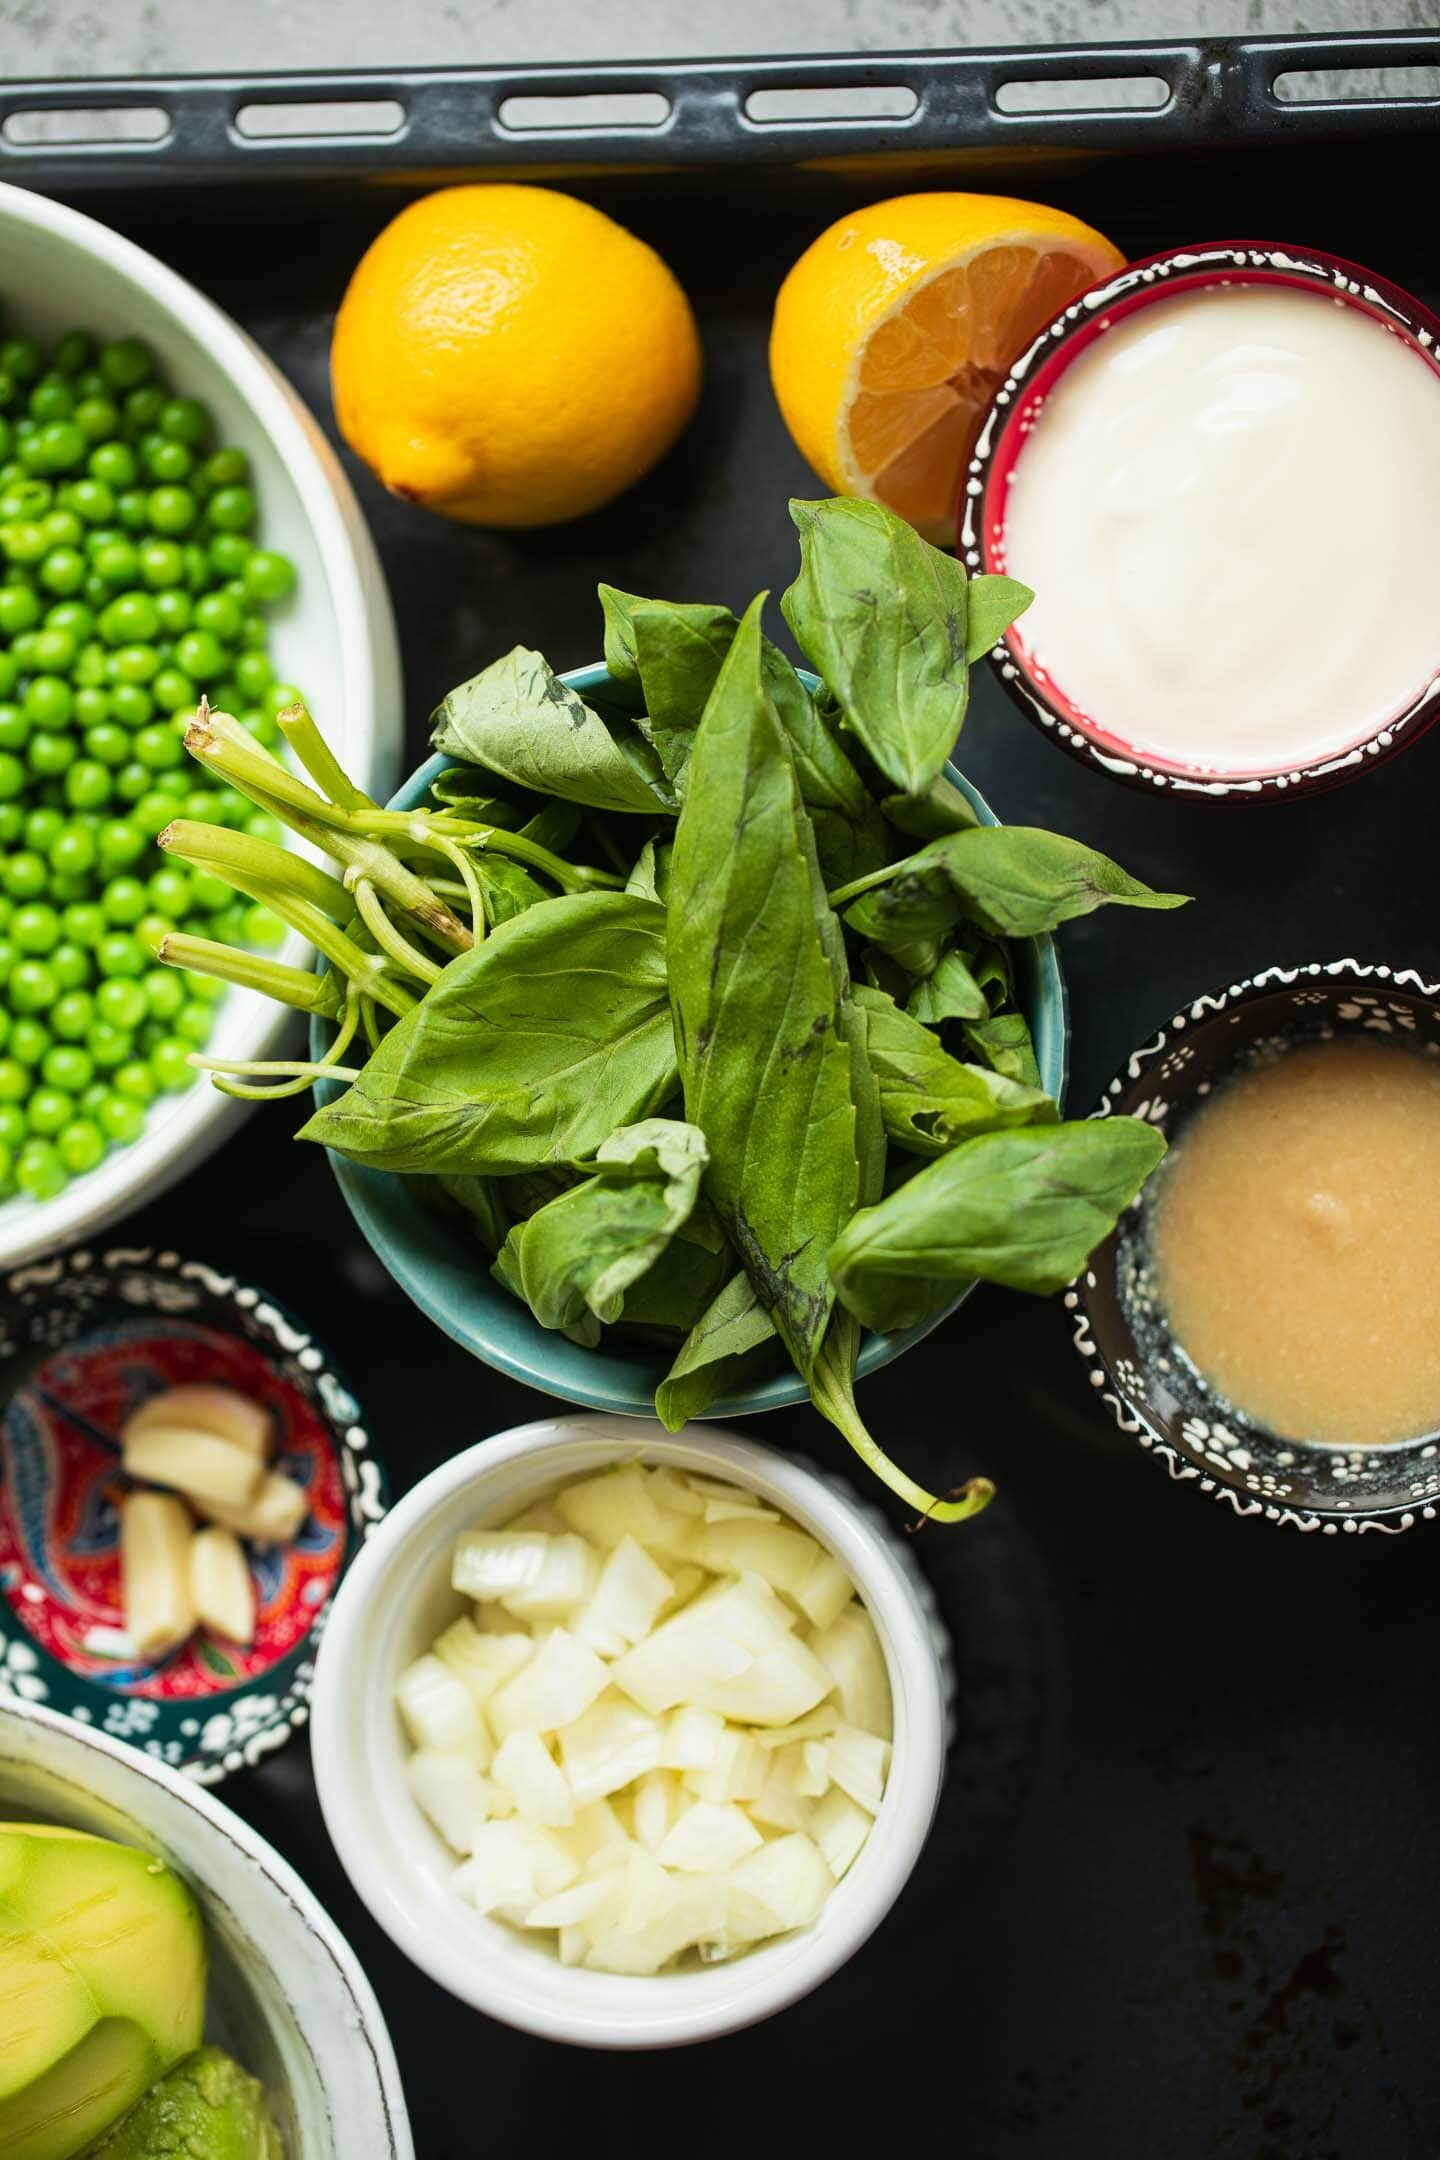 Ingredients for pea and avocado pesto pasta